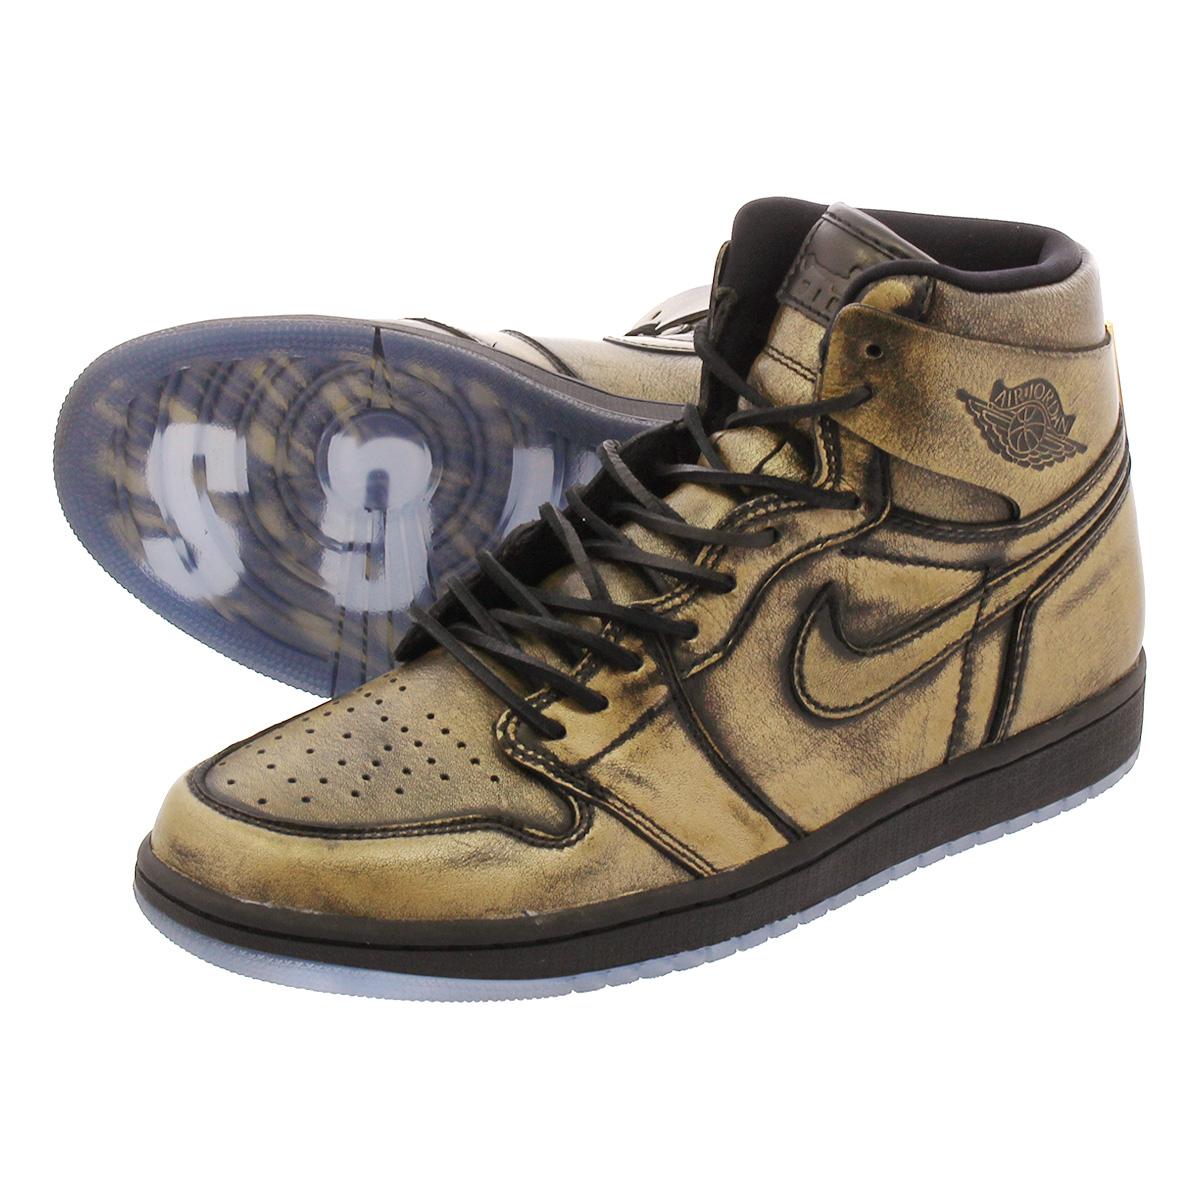 160450e499e NIKE AIR JORDAN 1 RETRO HIGH OG Nike Air Jordan 1 nostalgic high OG  BLACK METALLIC GOLD aa2887-035